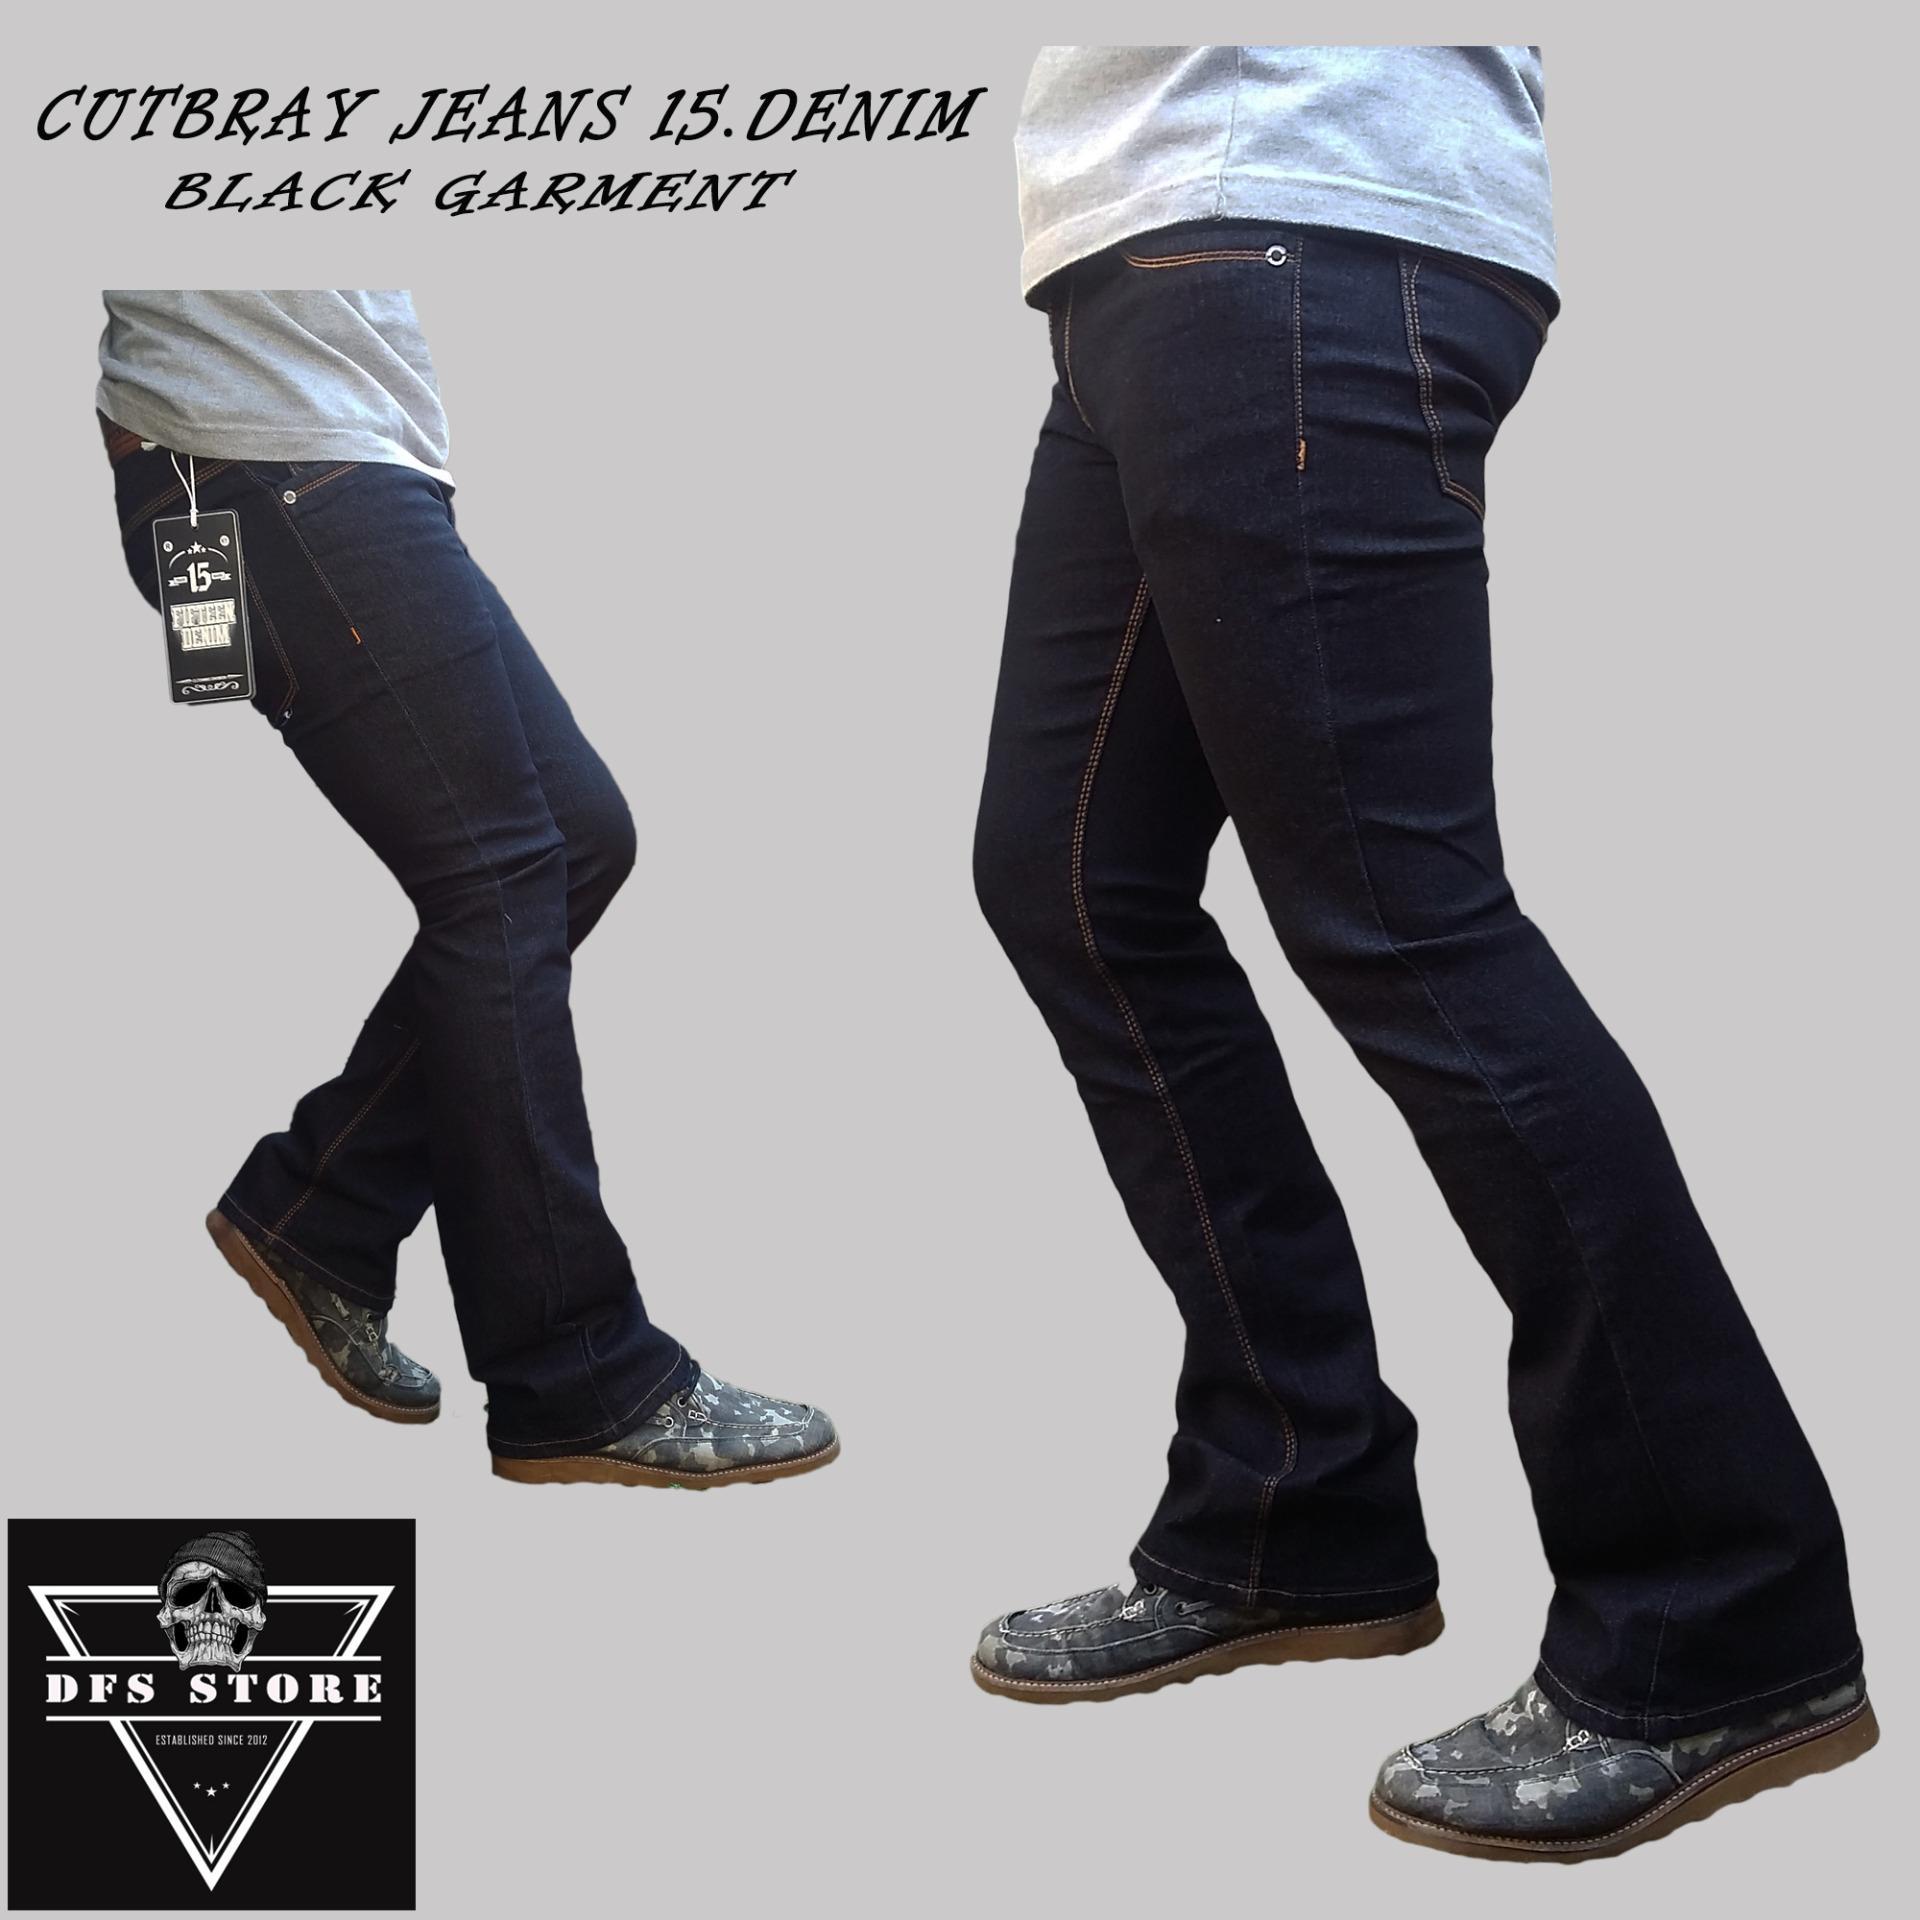 Jual Dfs Celana Jeans Denim Cutbray Rpia Hitam Garment